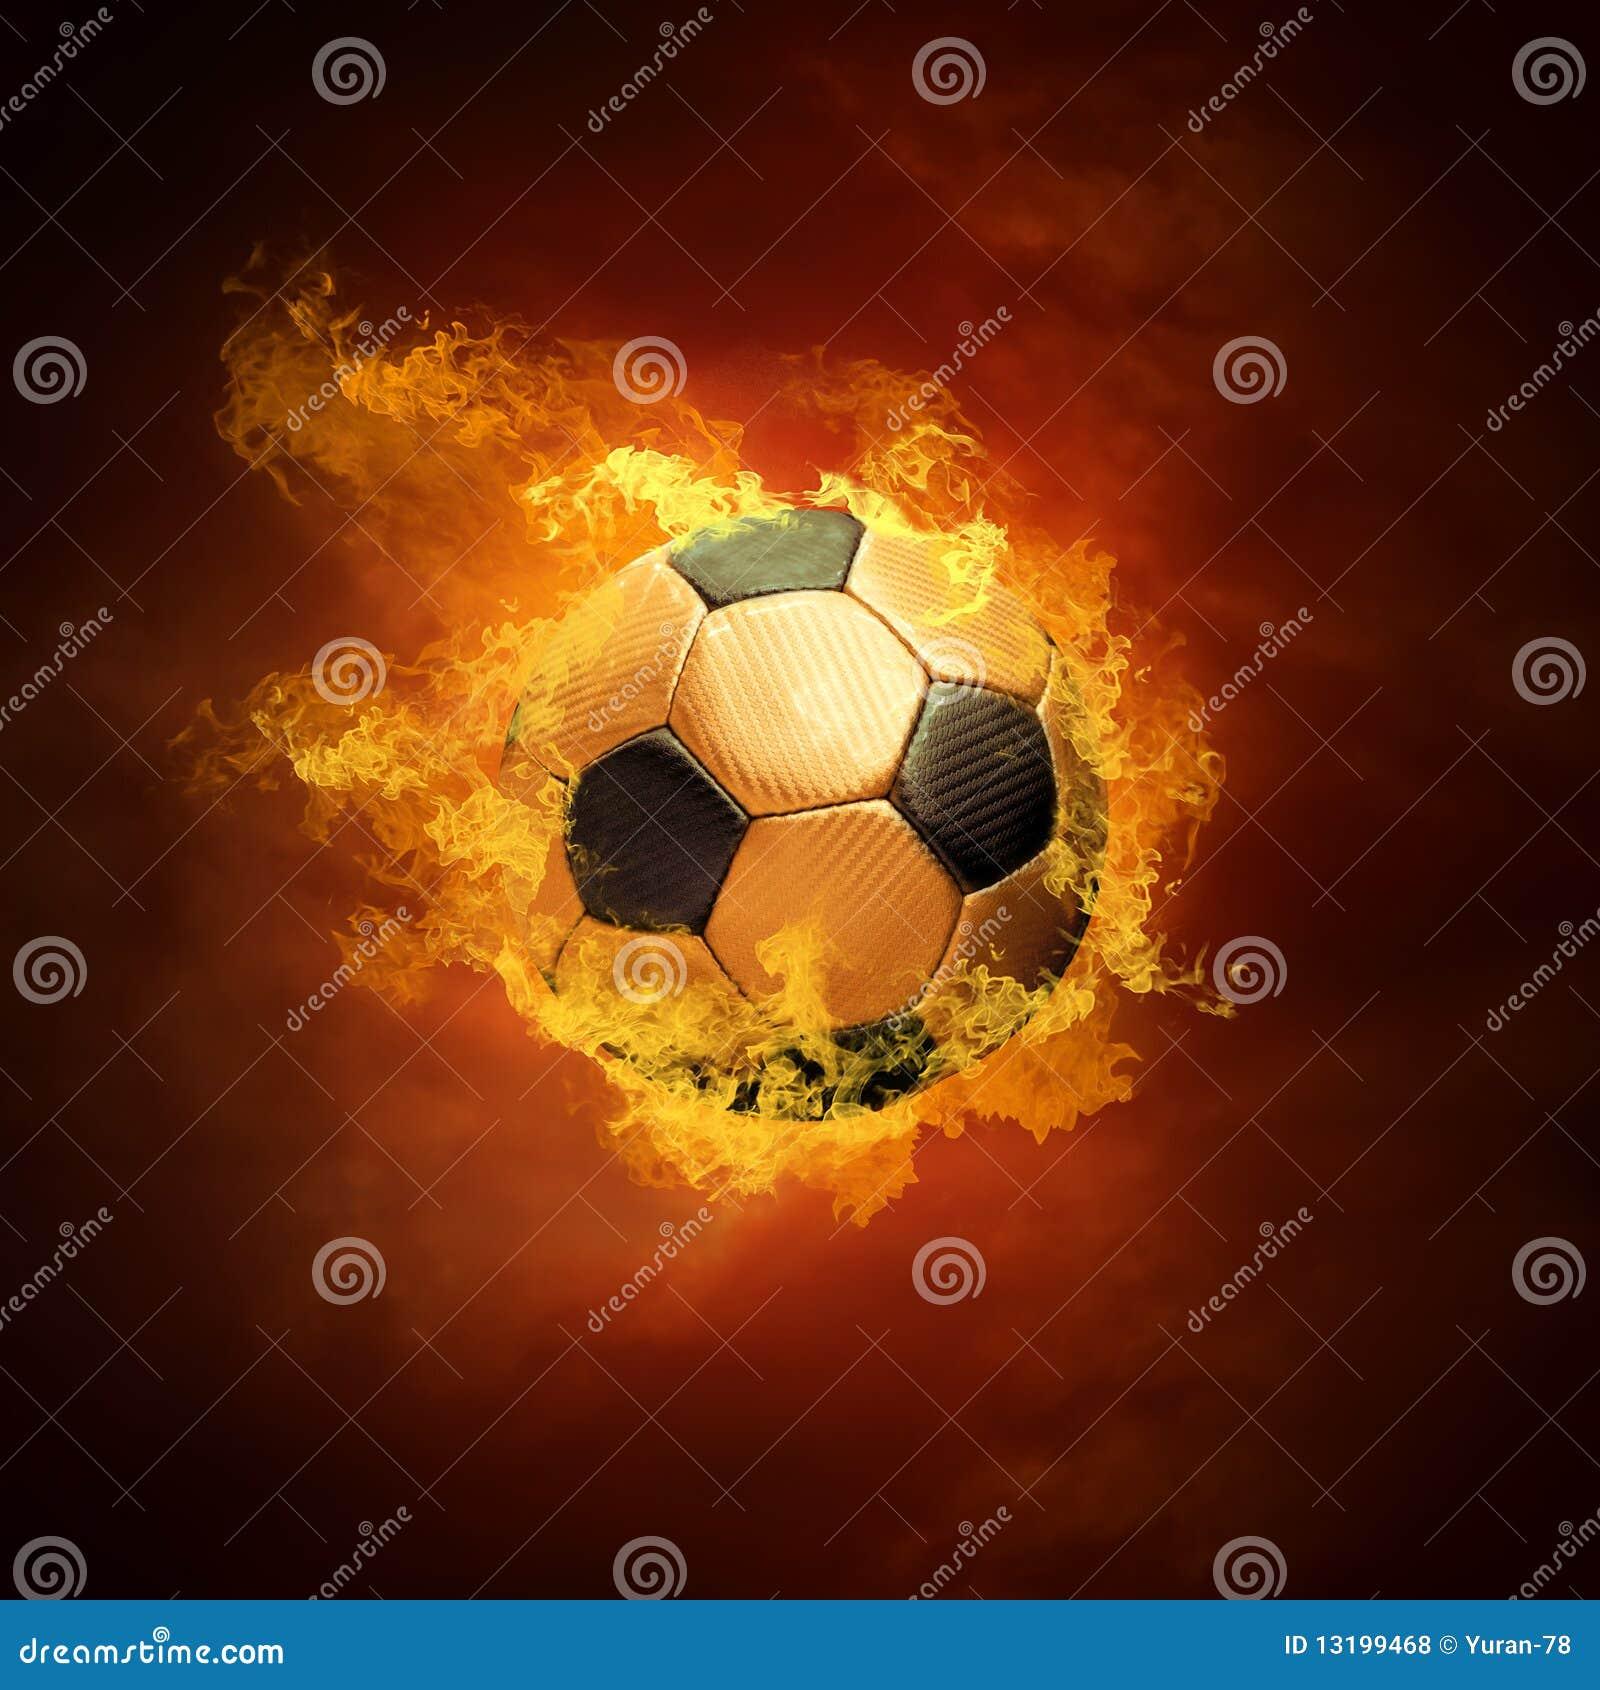 Esfera e incêndio de futebol